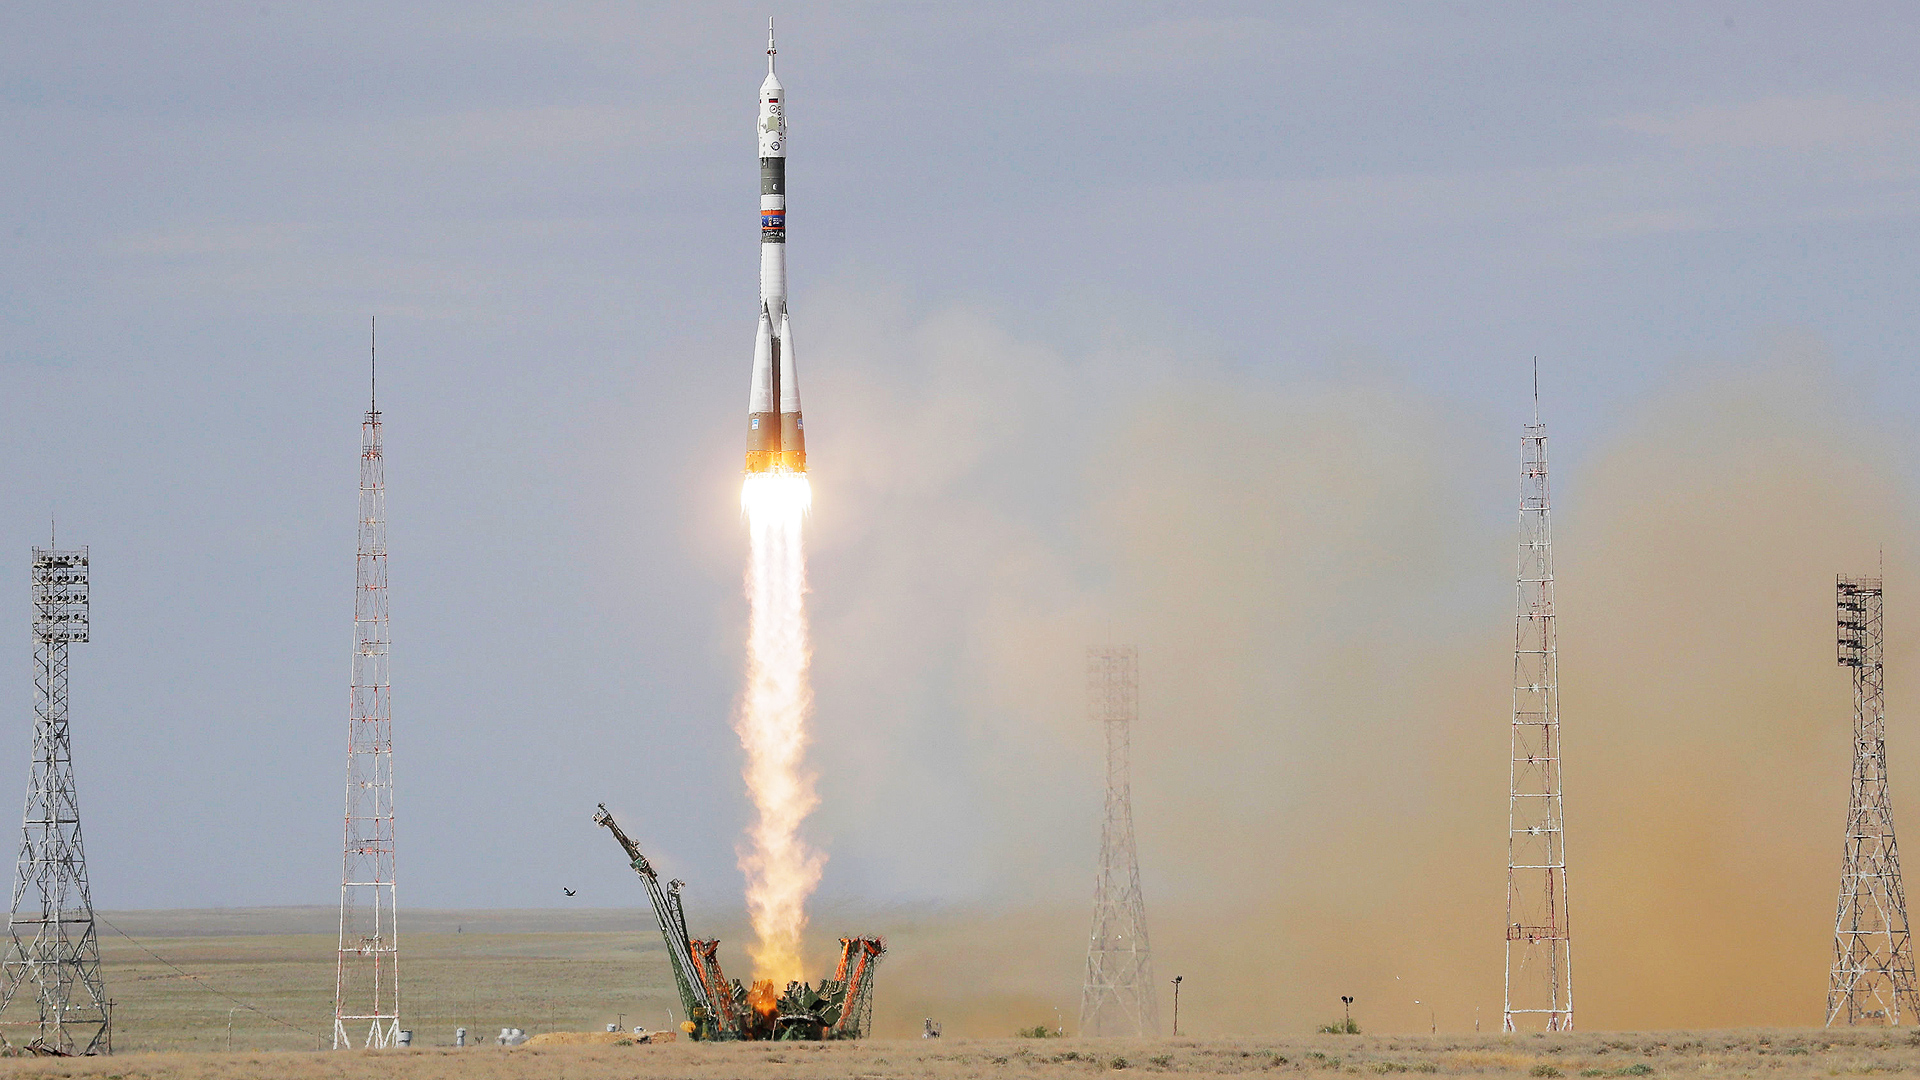 Die Sojus-Rakete startet